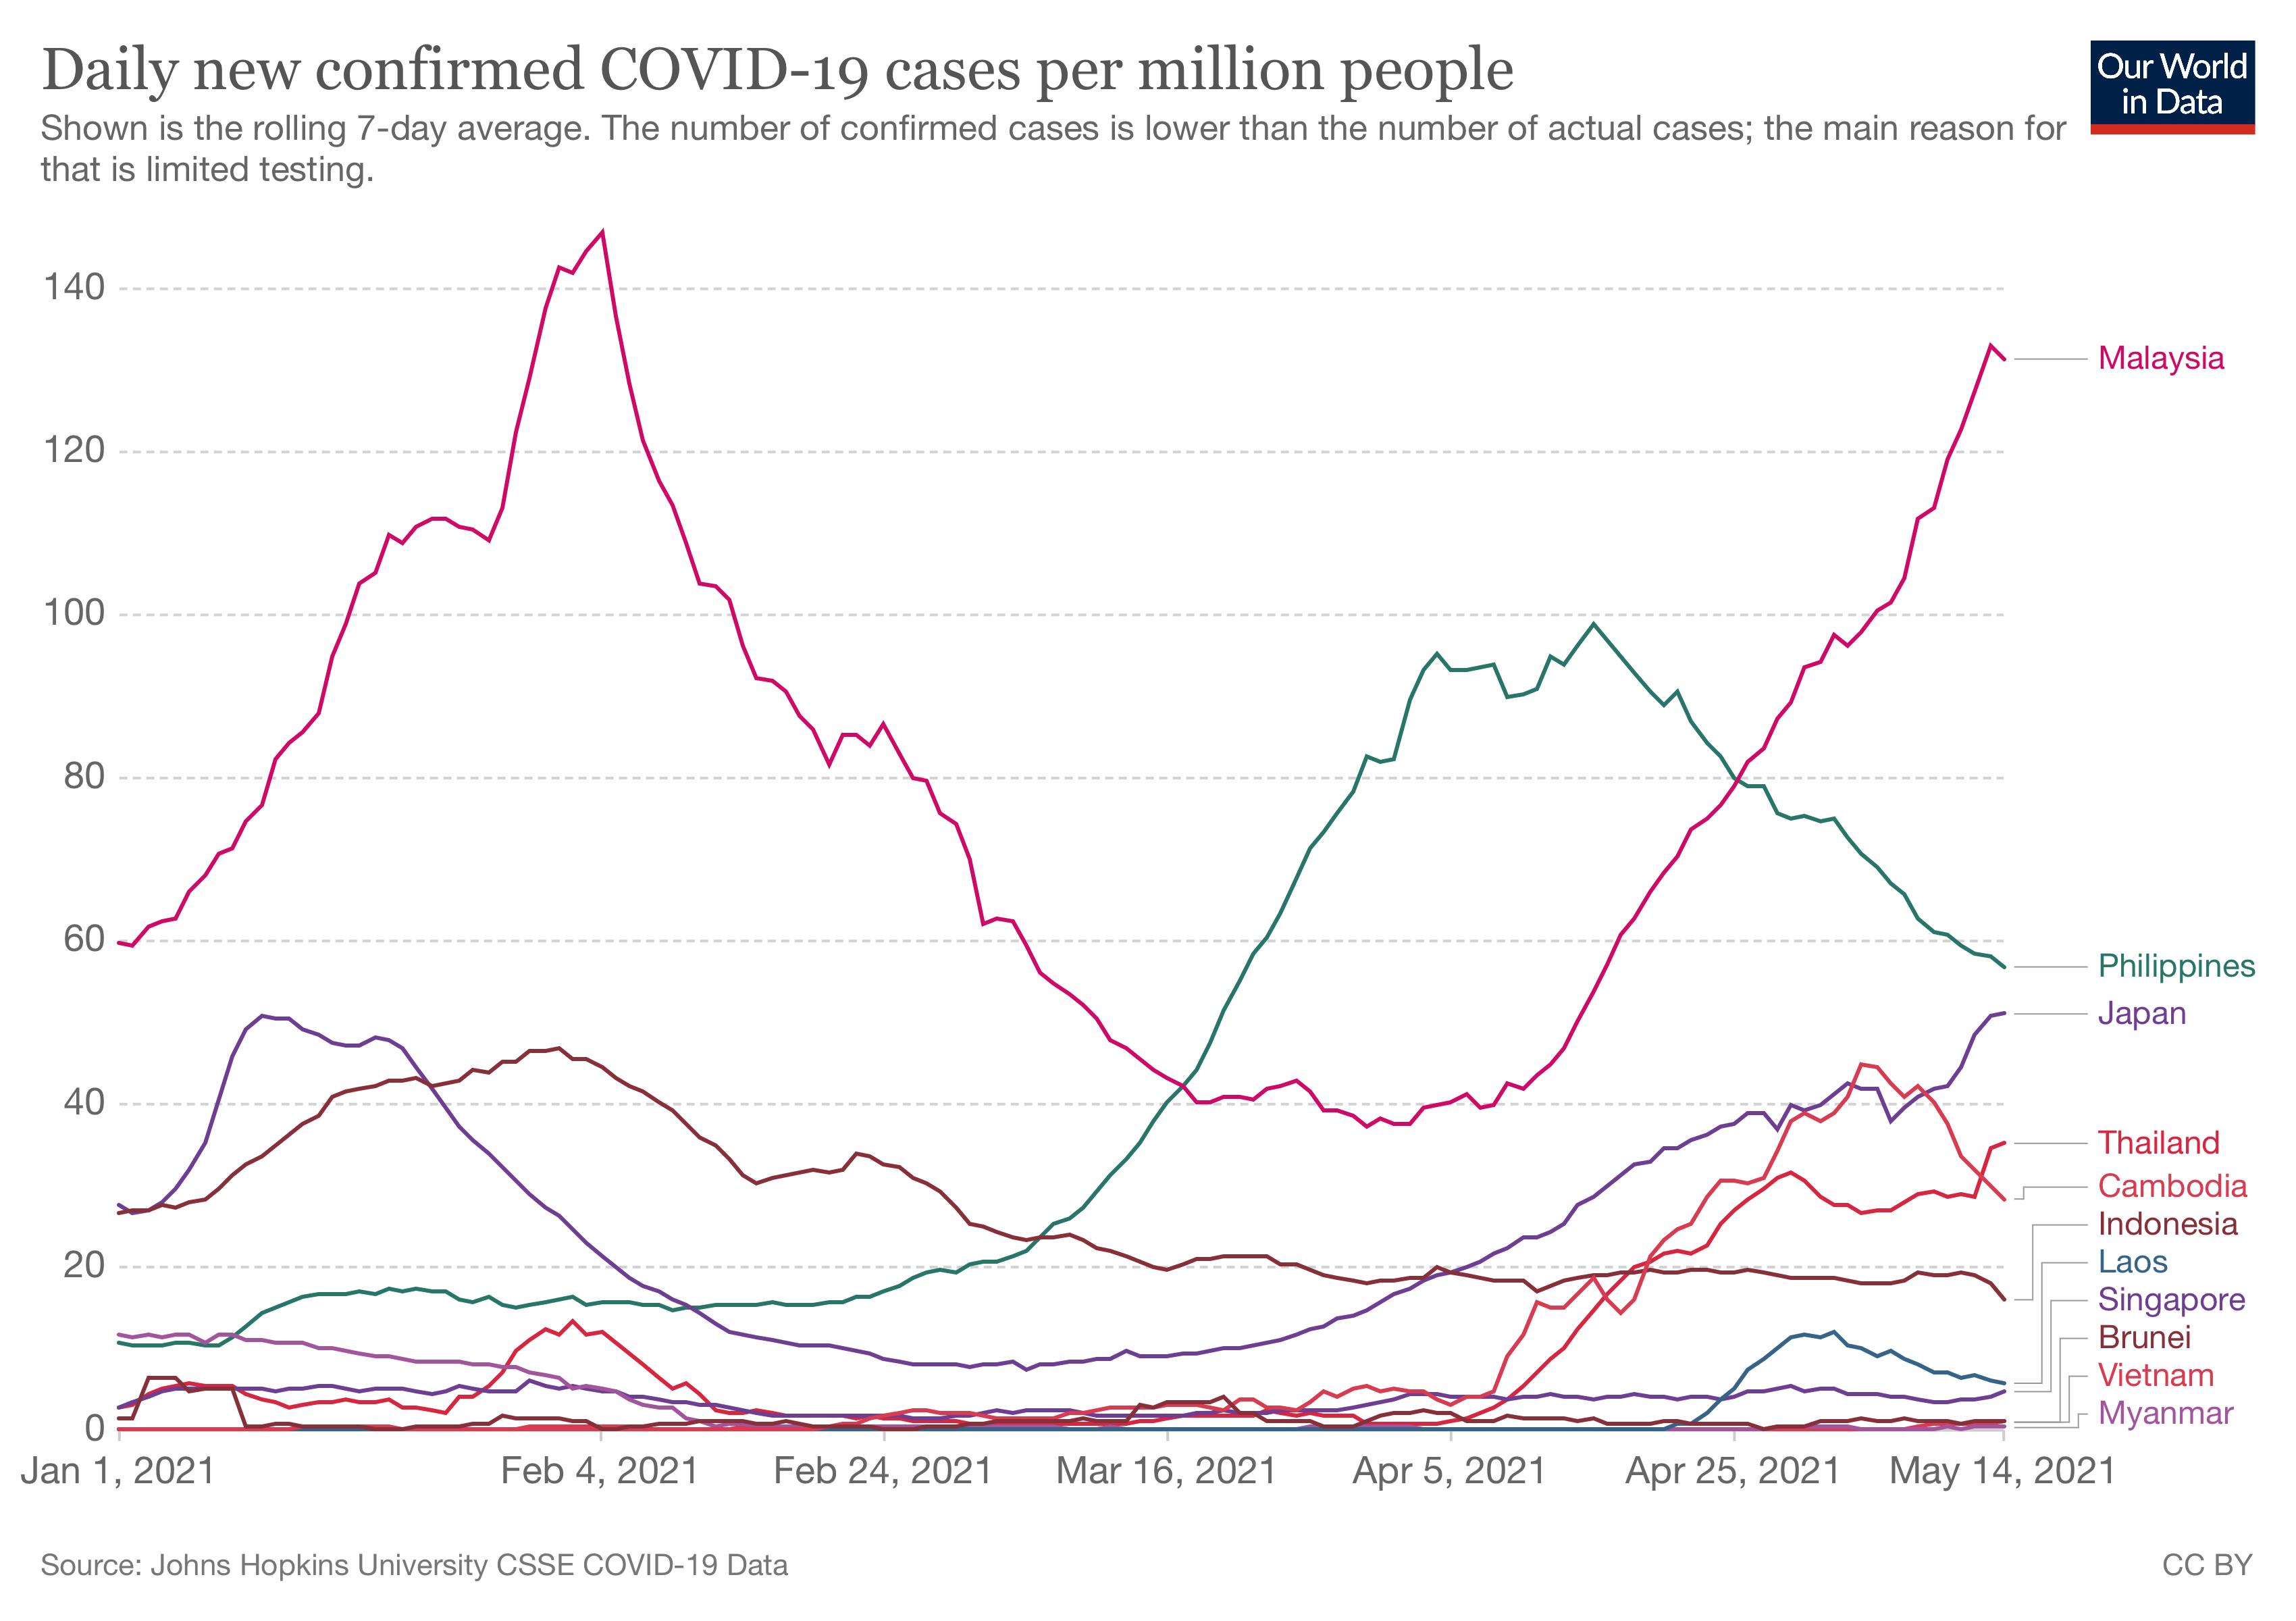 coronavirus-data-explorer south east asia countries